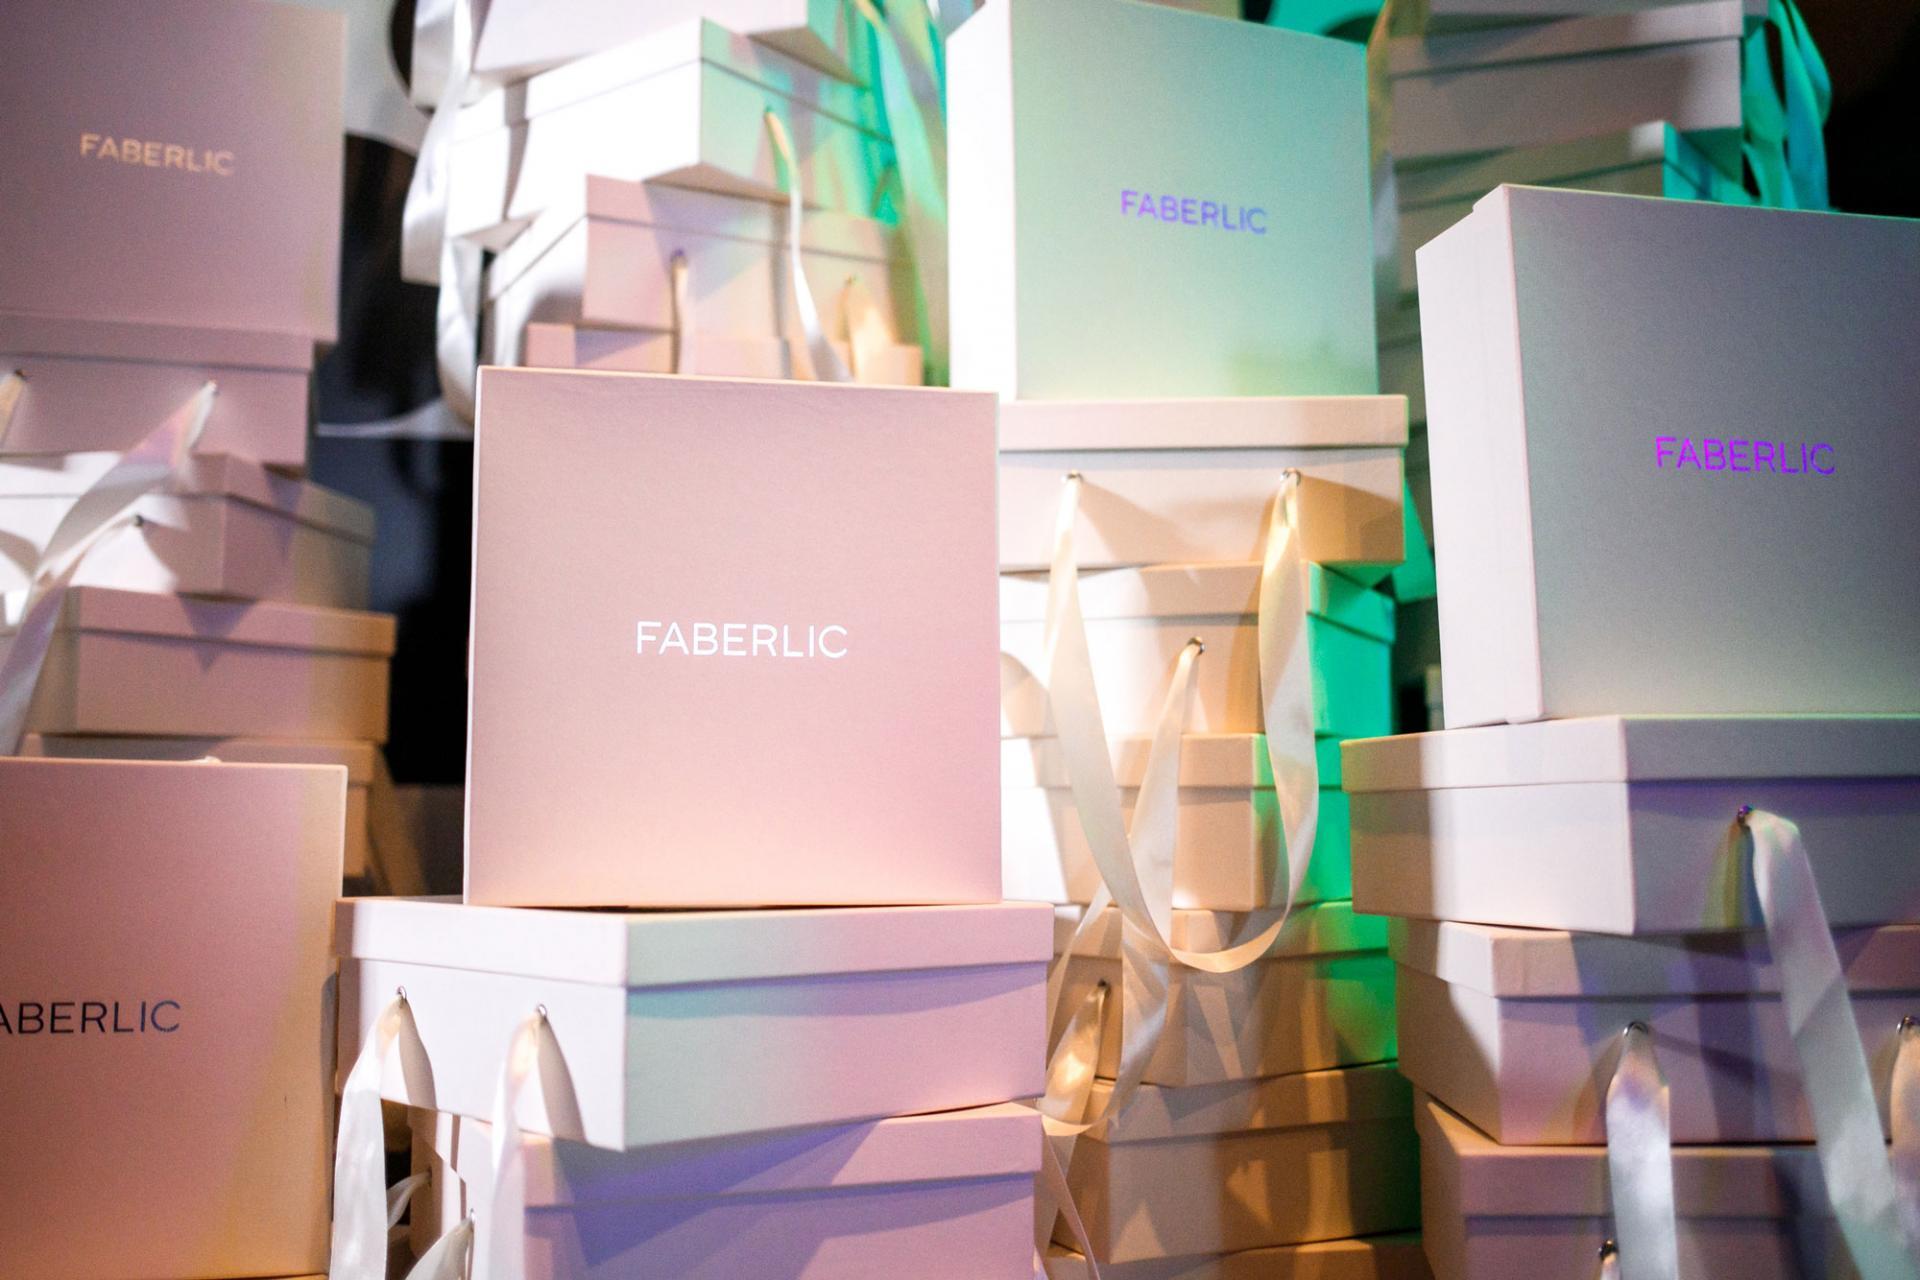 Трендовые Glamour, Romantic, Minimalism, атакже Faberlic Men вновом сезоне весна/лето 2020 отFaberlic